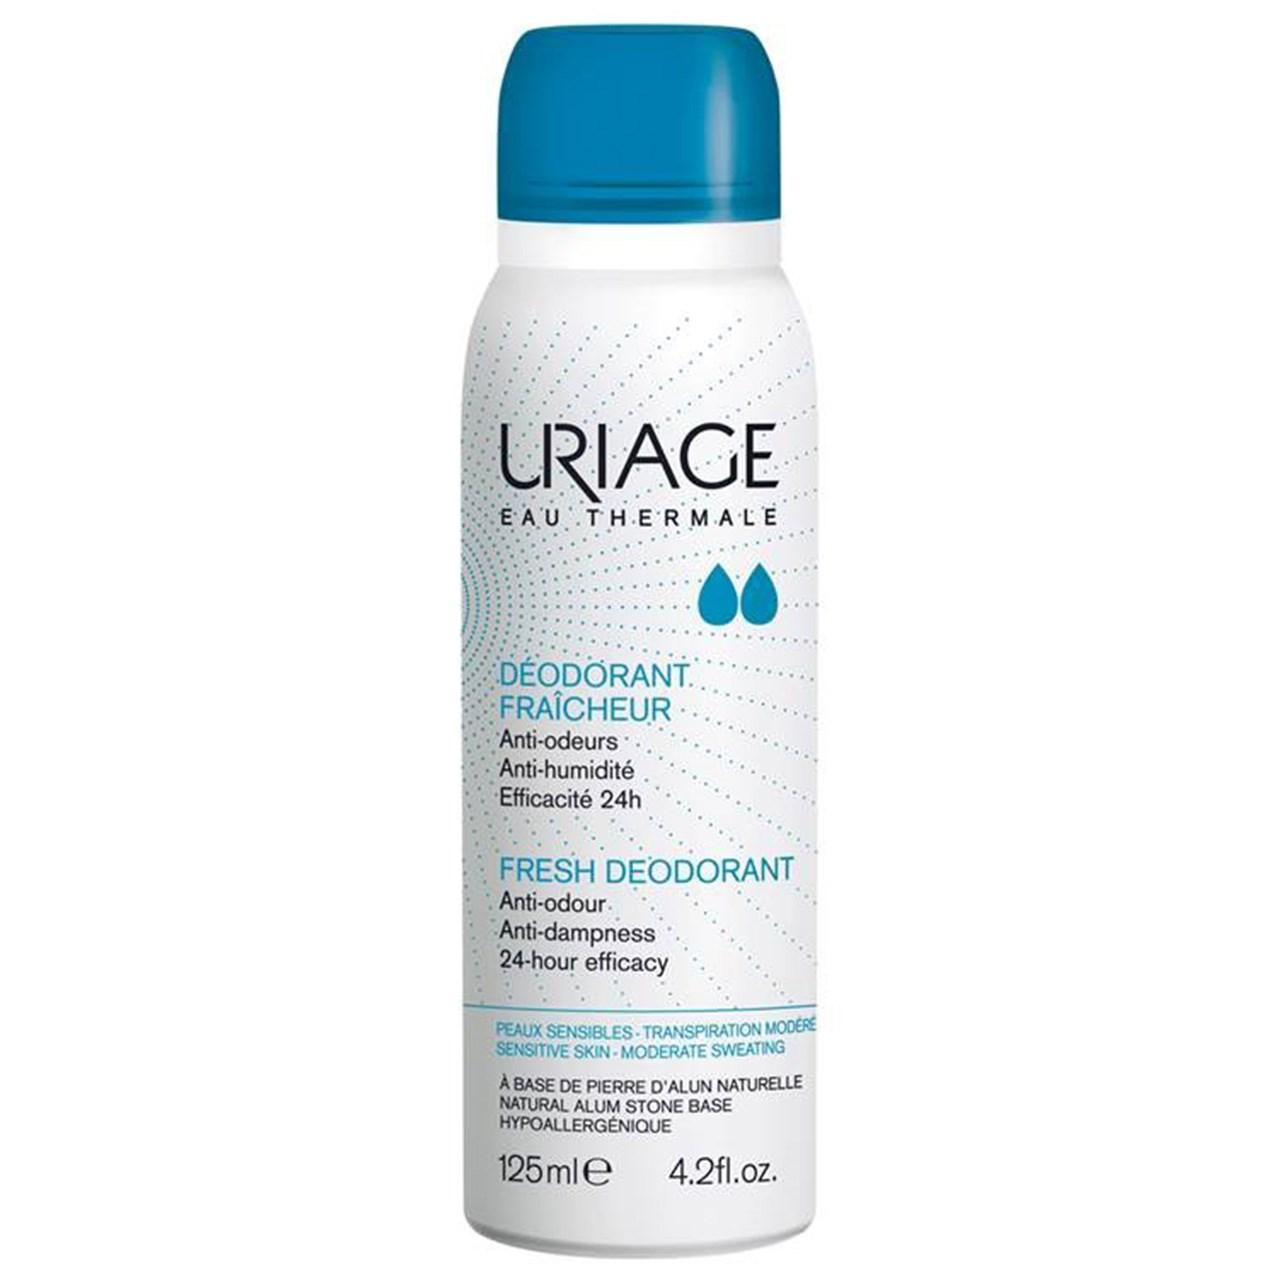 قیمت اسپری ضد تعریق اوریاژ مدل Fresh Deodorant حجم 125 میلی لیتر